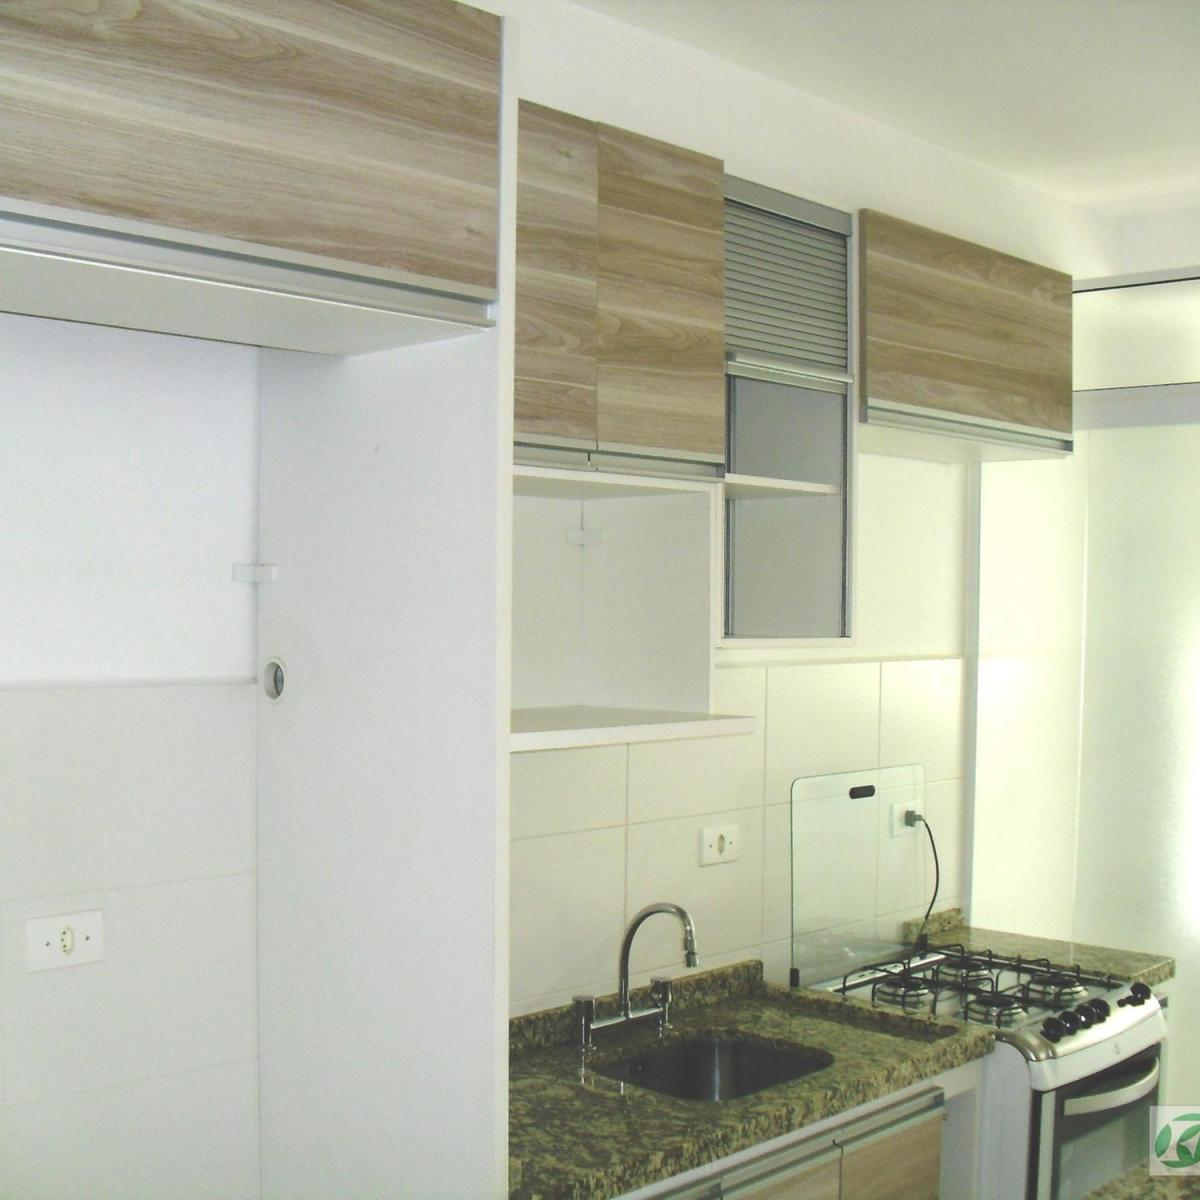 Comprido Curitiba R$ 1.200 6800 m2 ID: 2930503868 Imovelweb #6B6B4C 1200x1200 Balcão Banheiro Curitiba